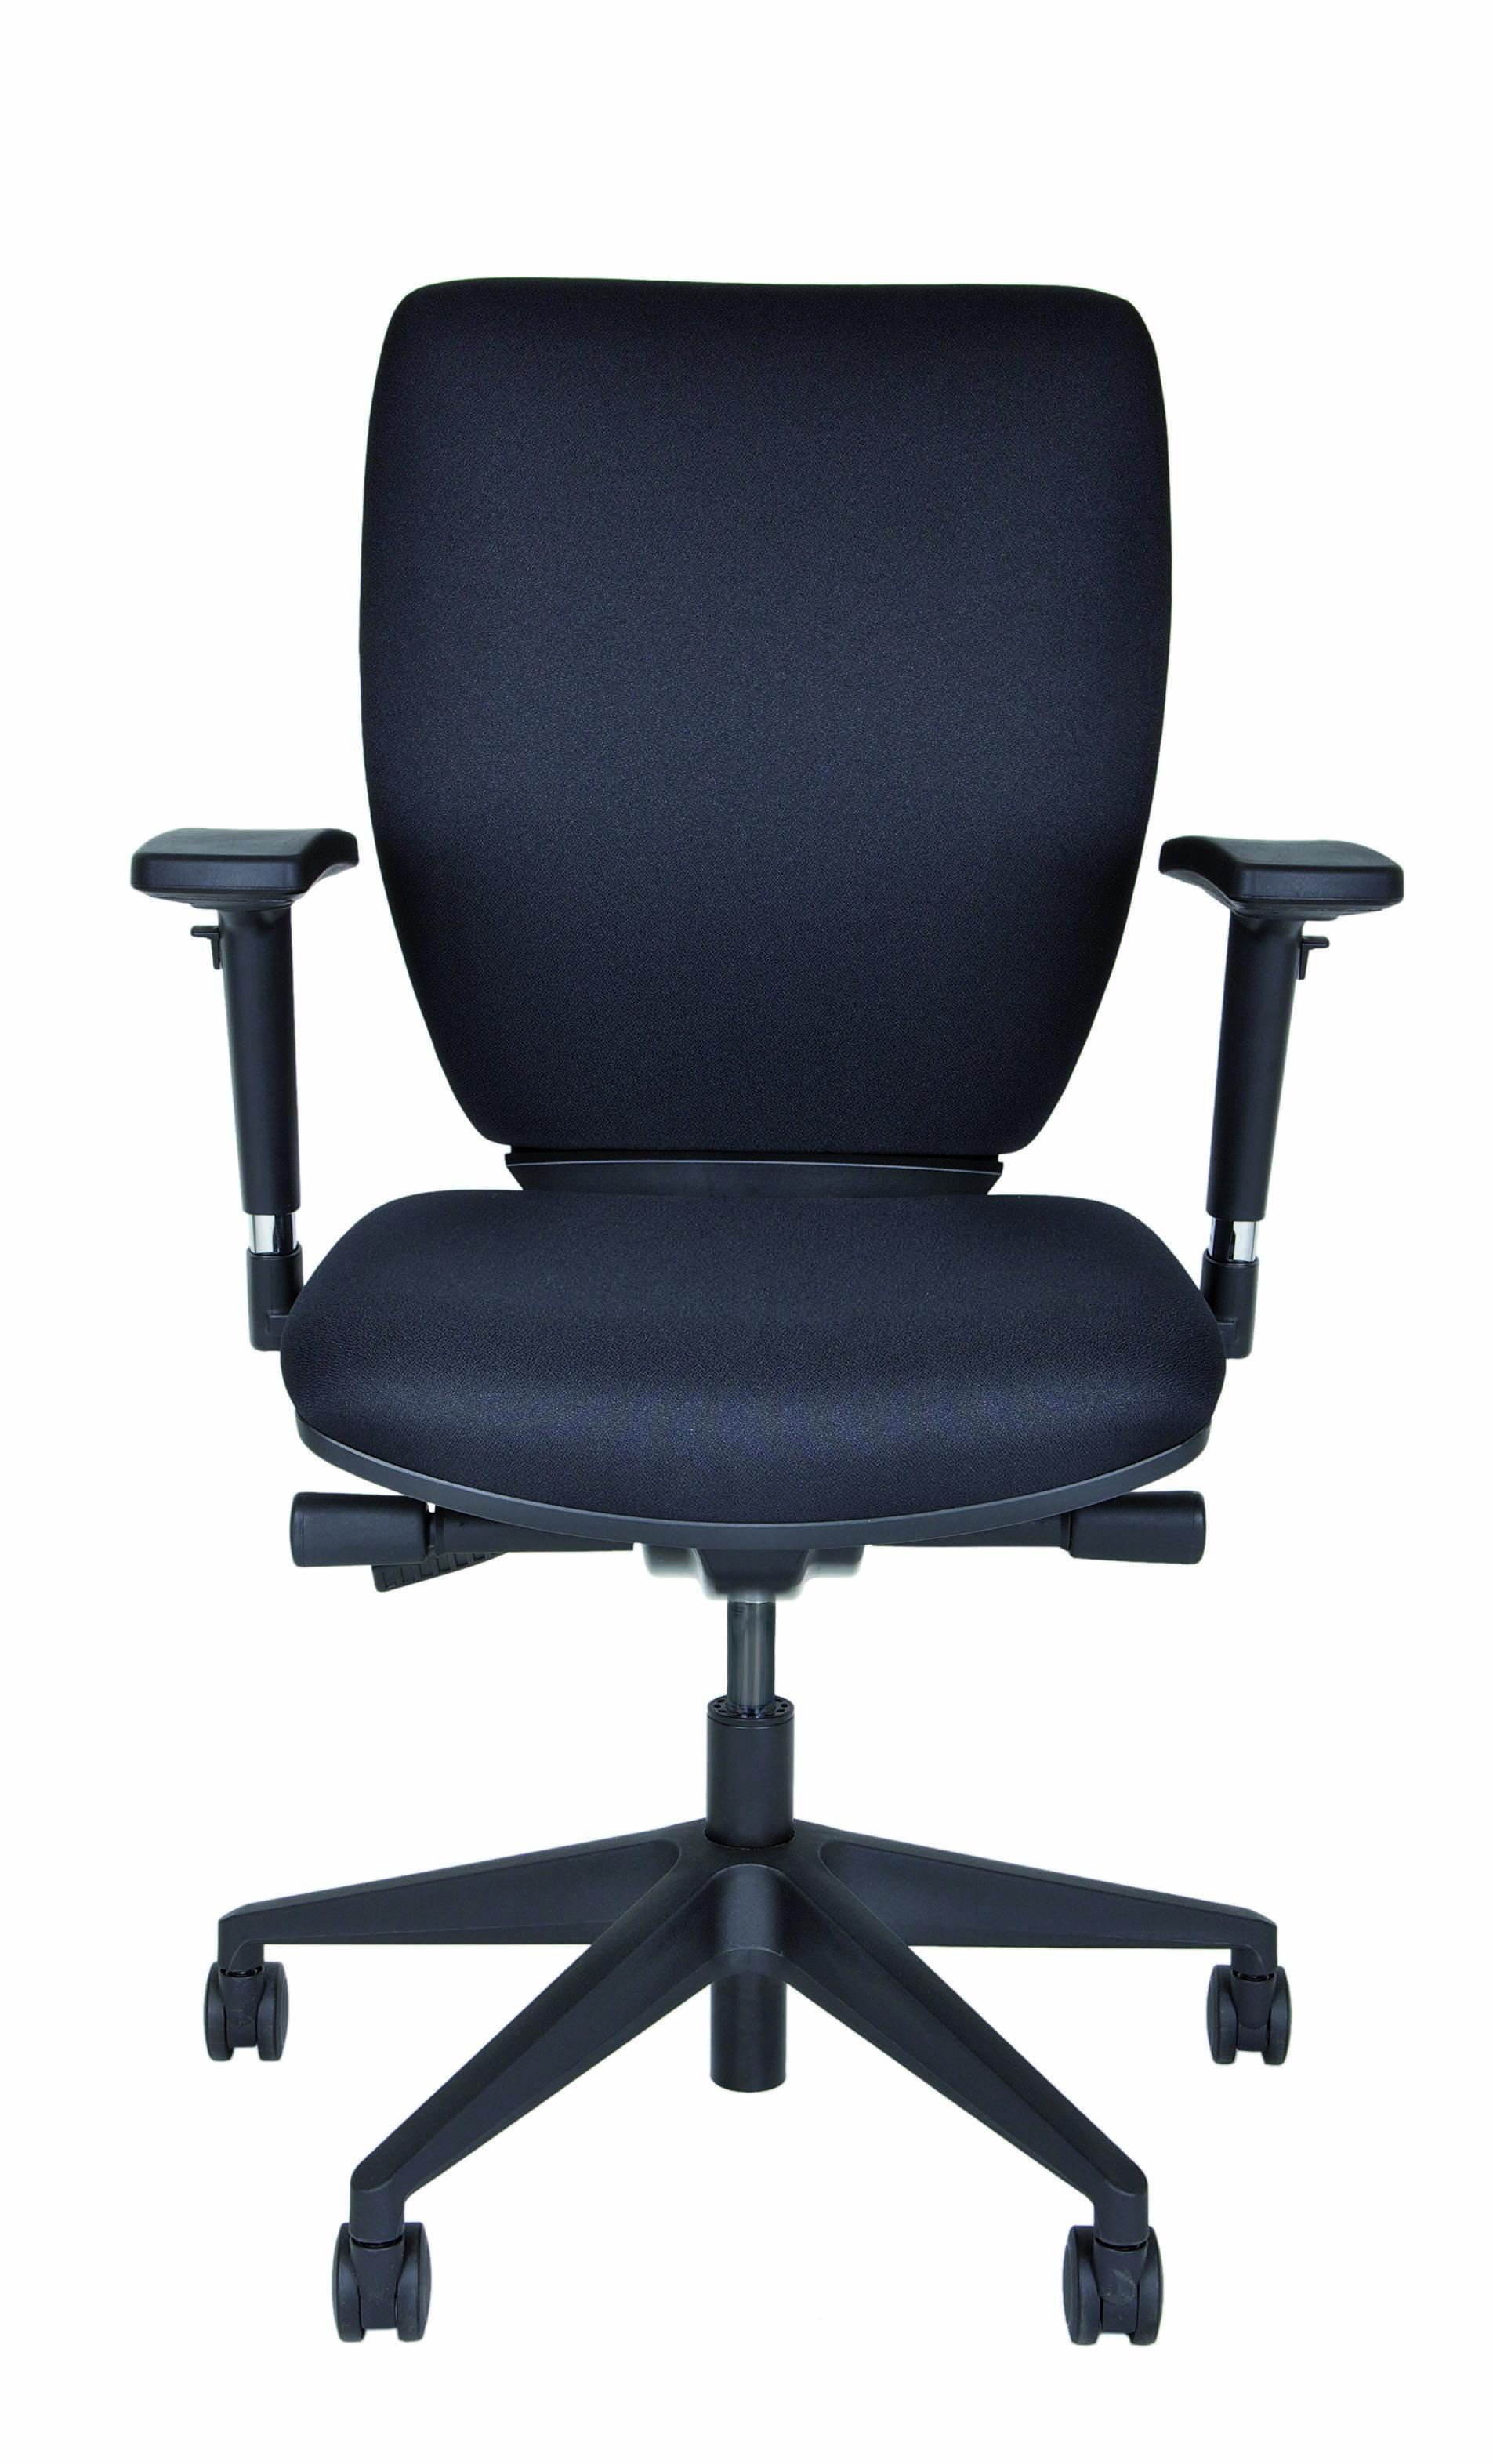 Bürodrehstuhl Optime, Polster, Kunststofffußkreuz